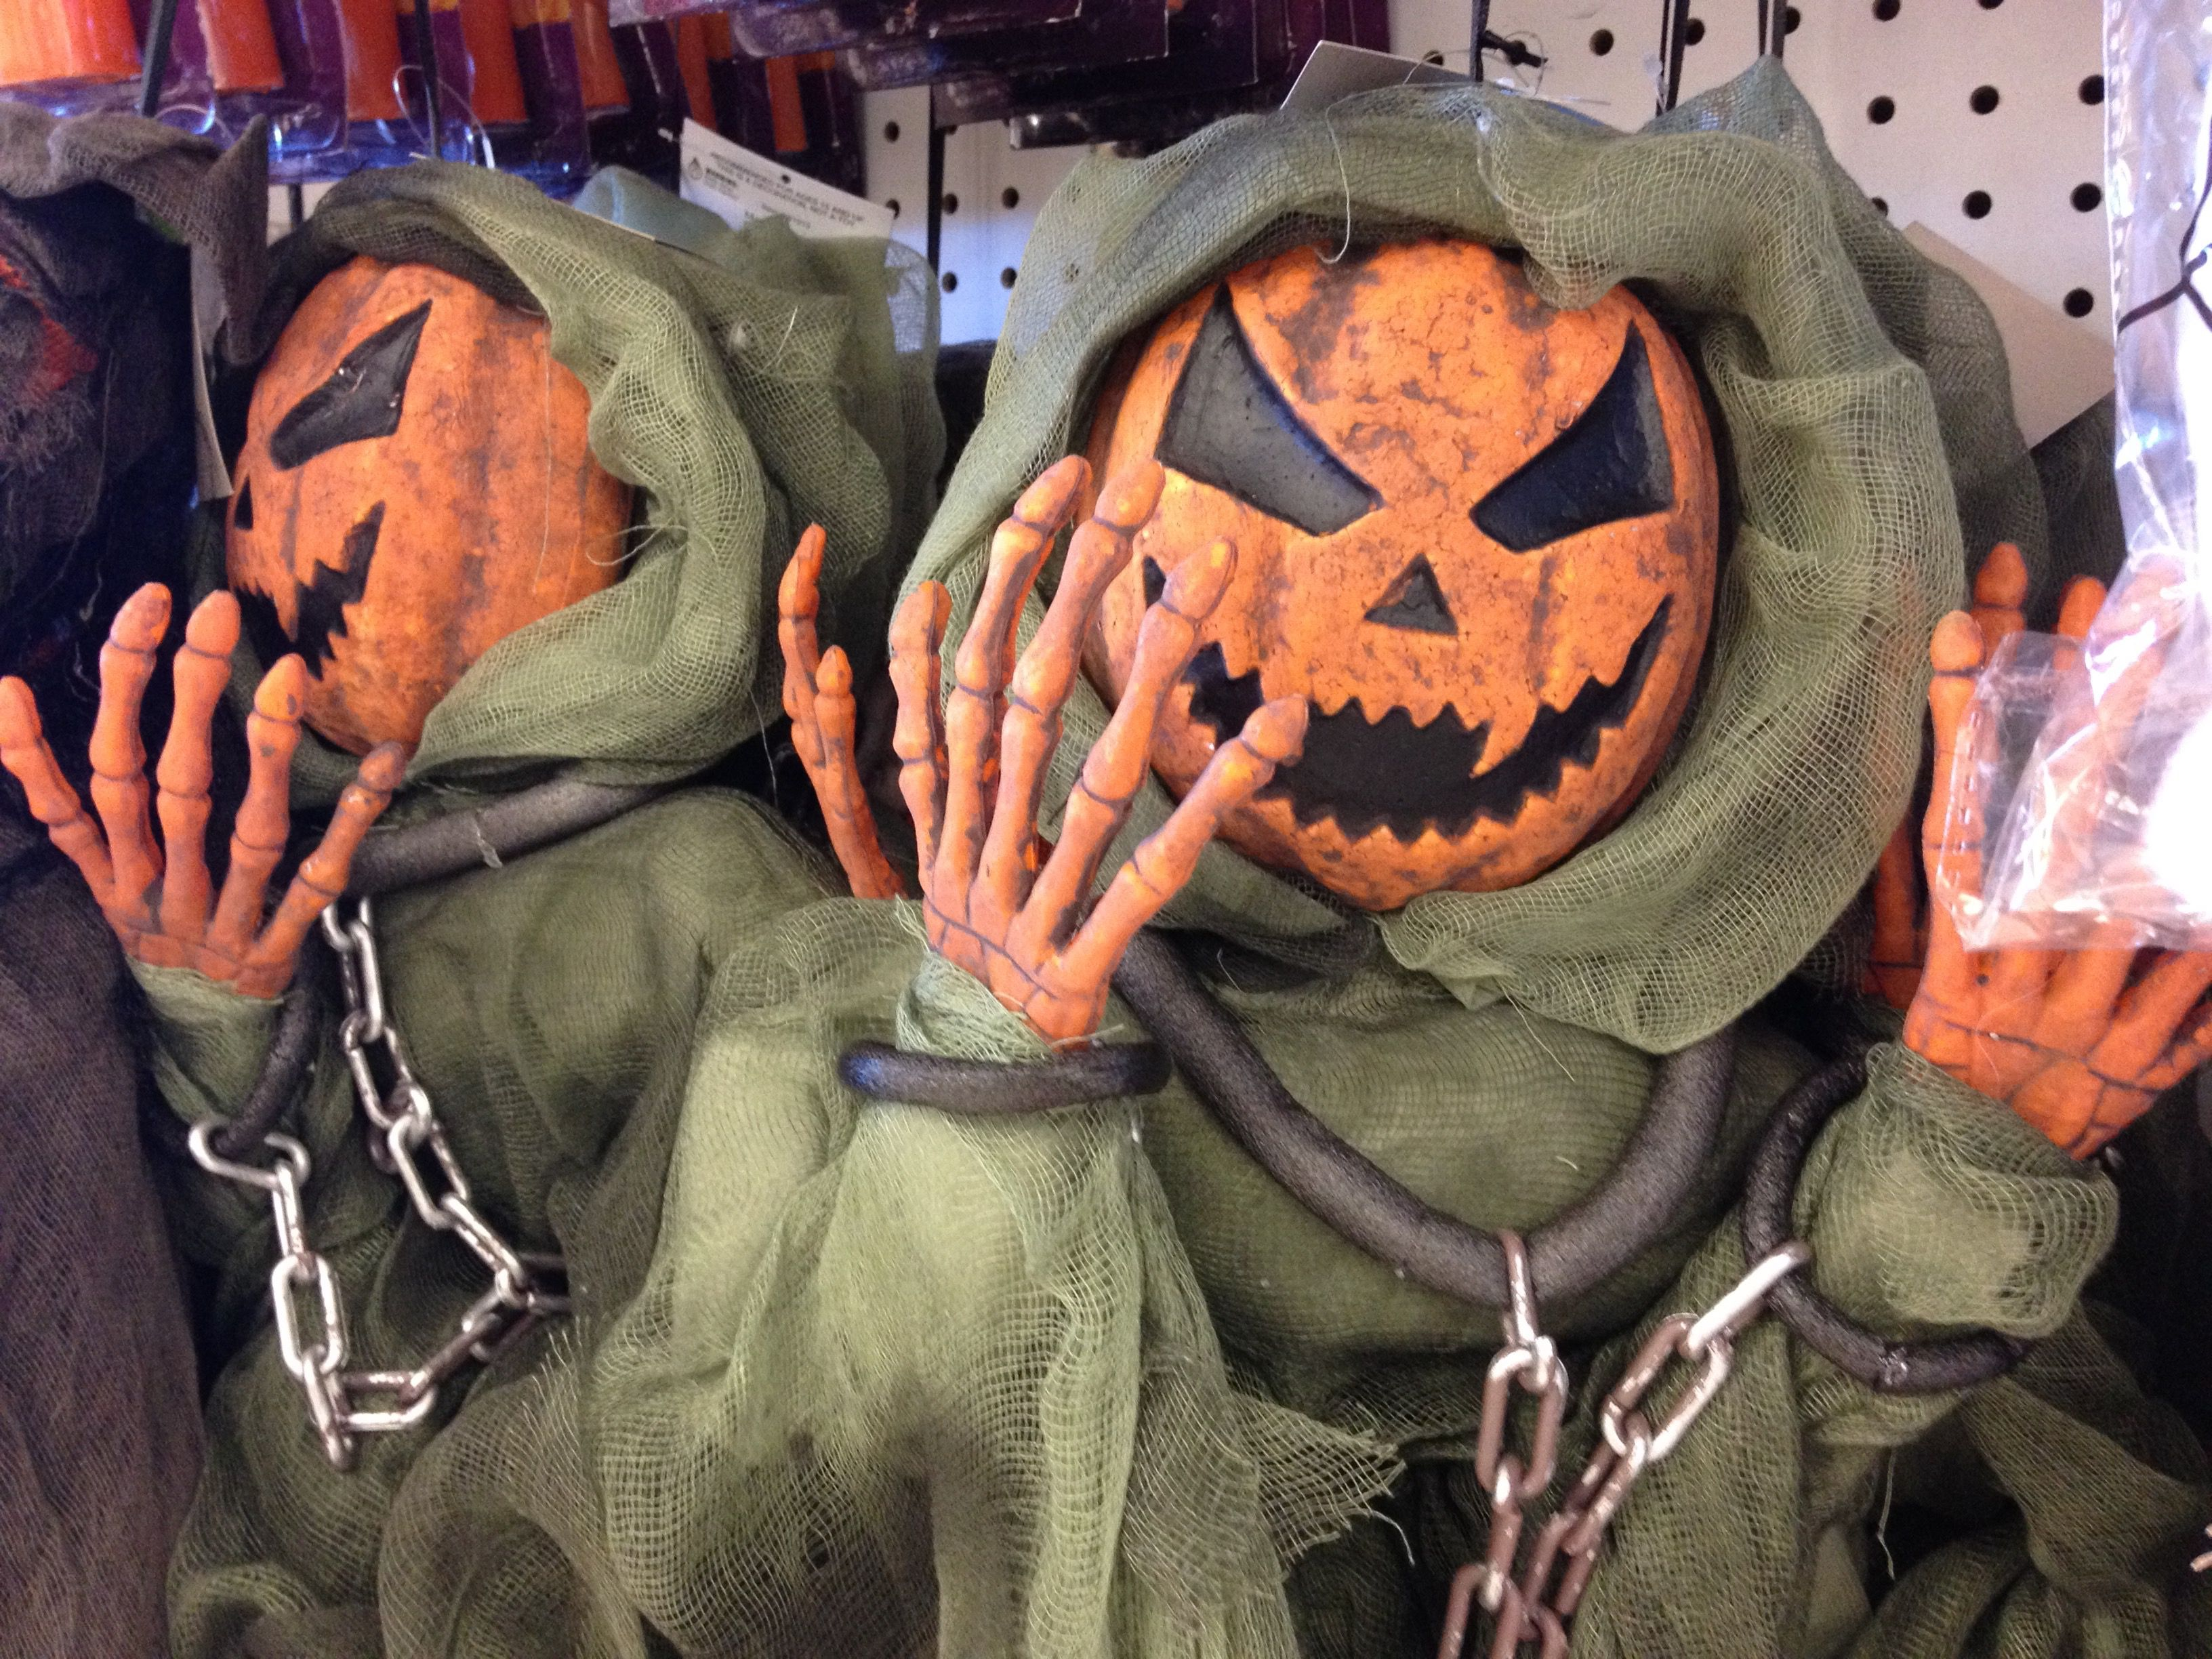 the best halloween shops in st. louis